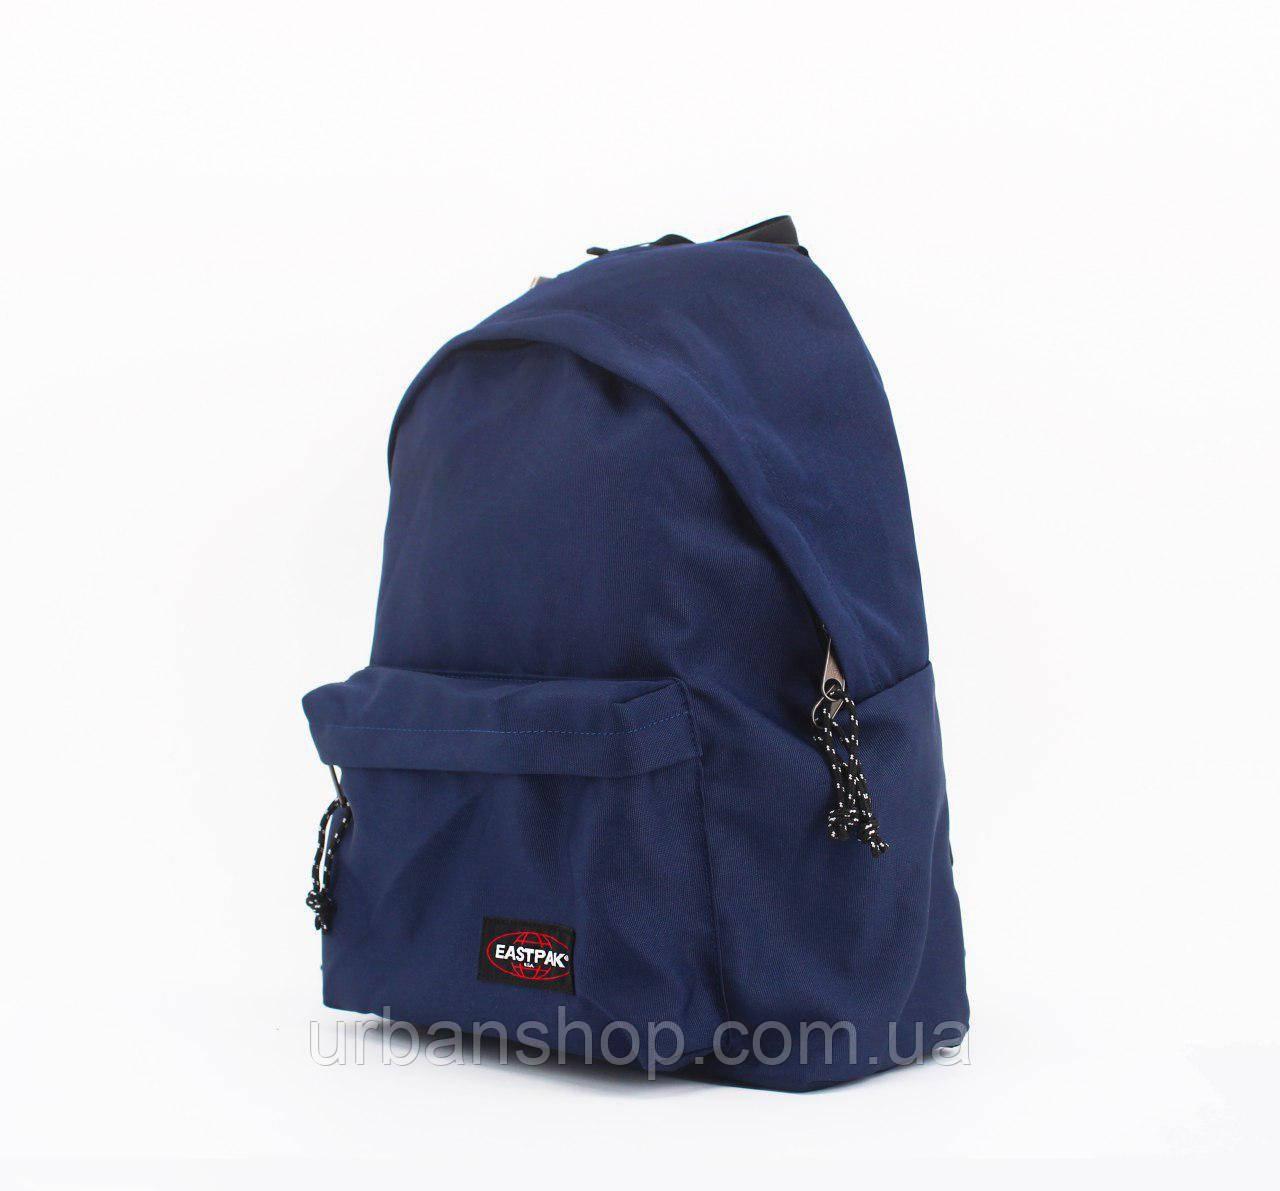 Рюкзак EASTPAK Deep blue